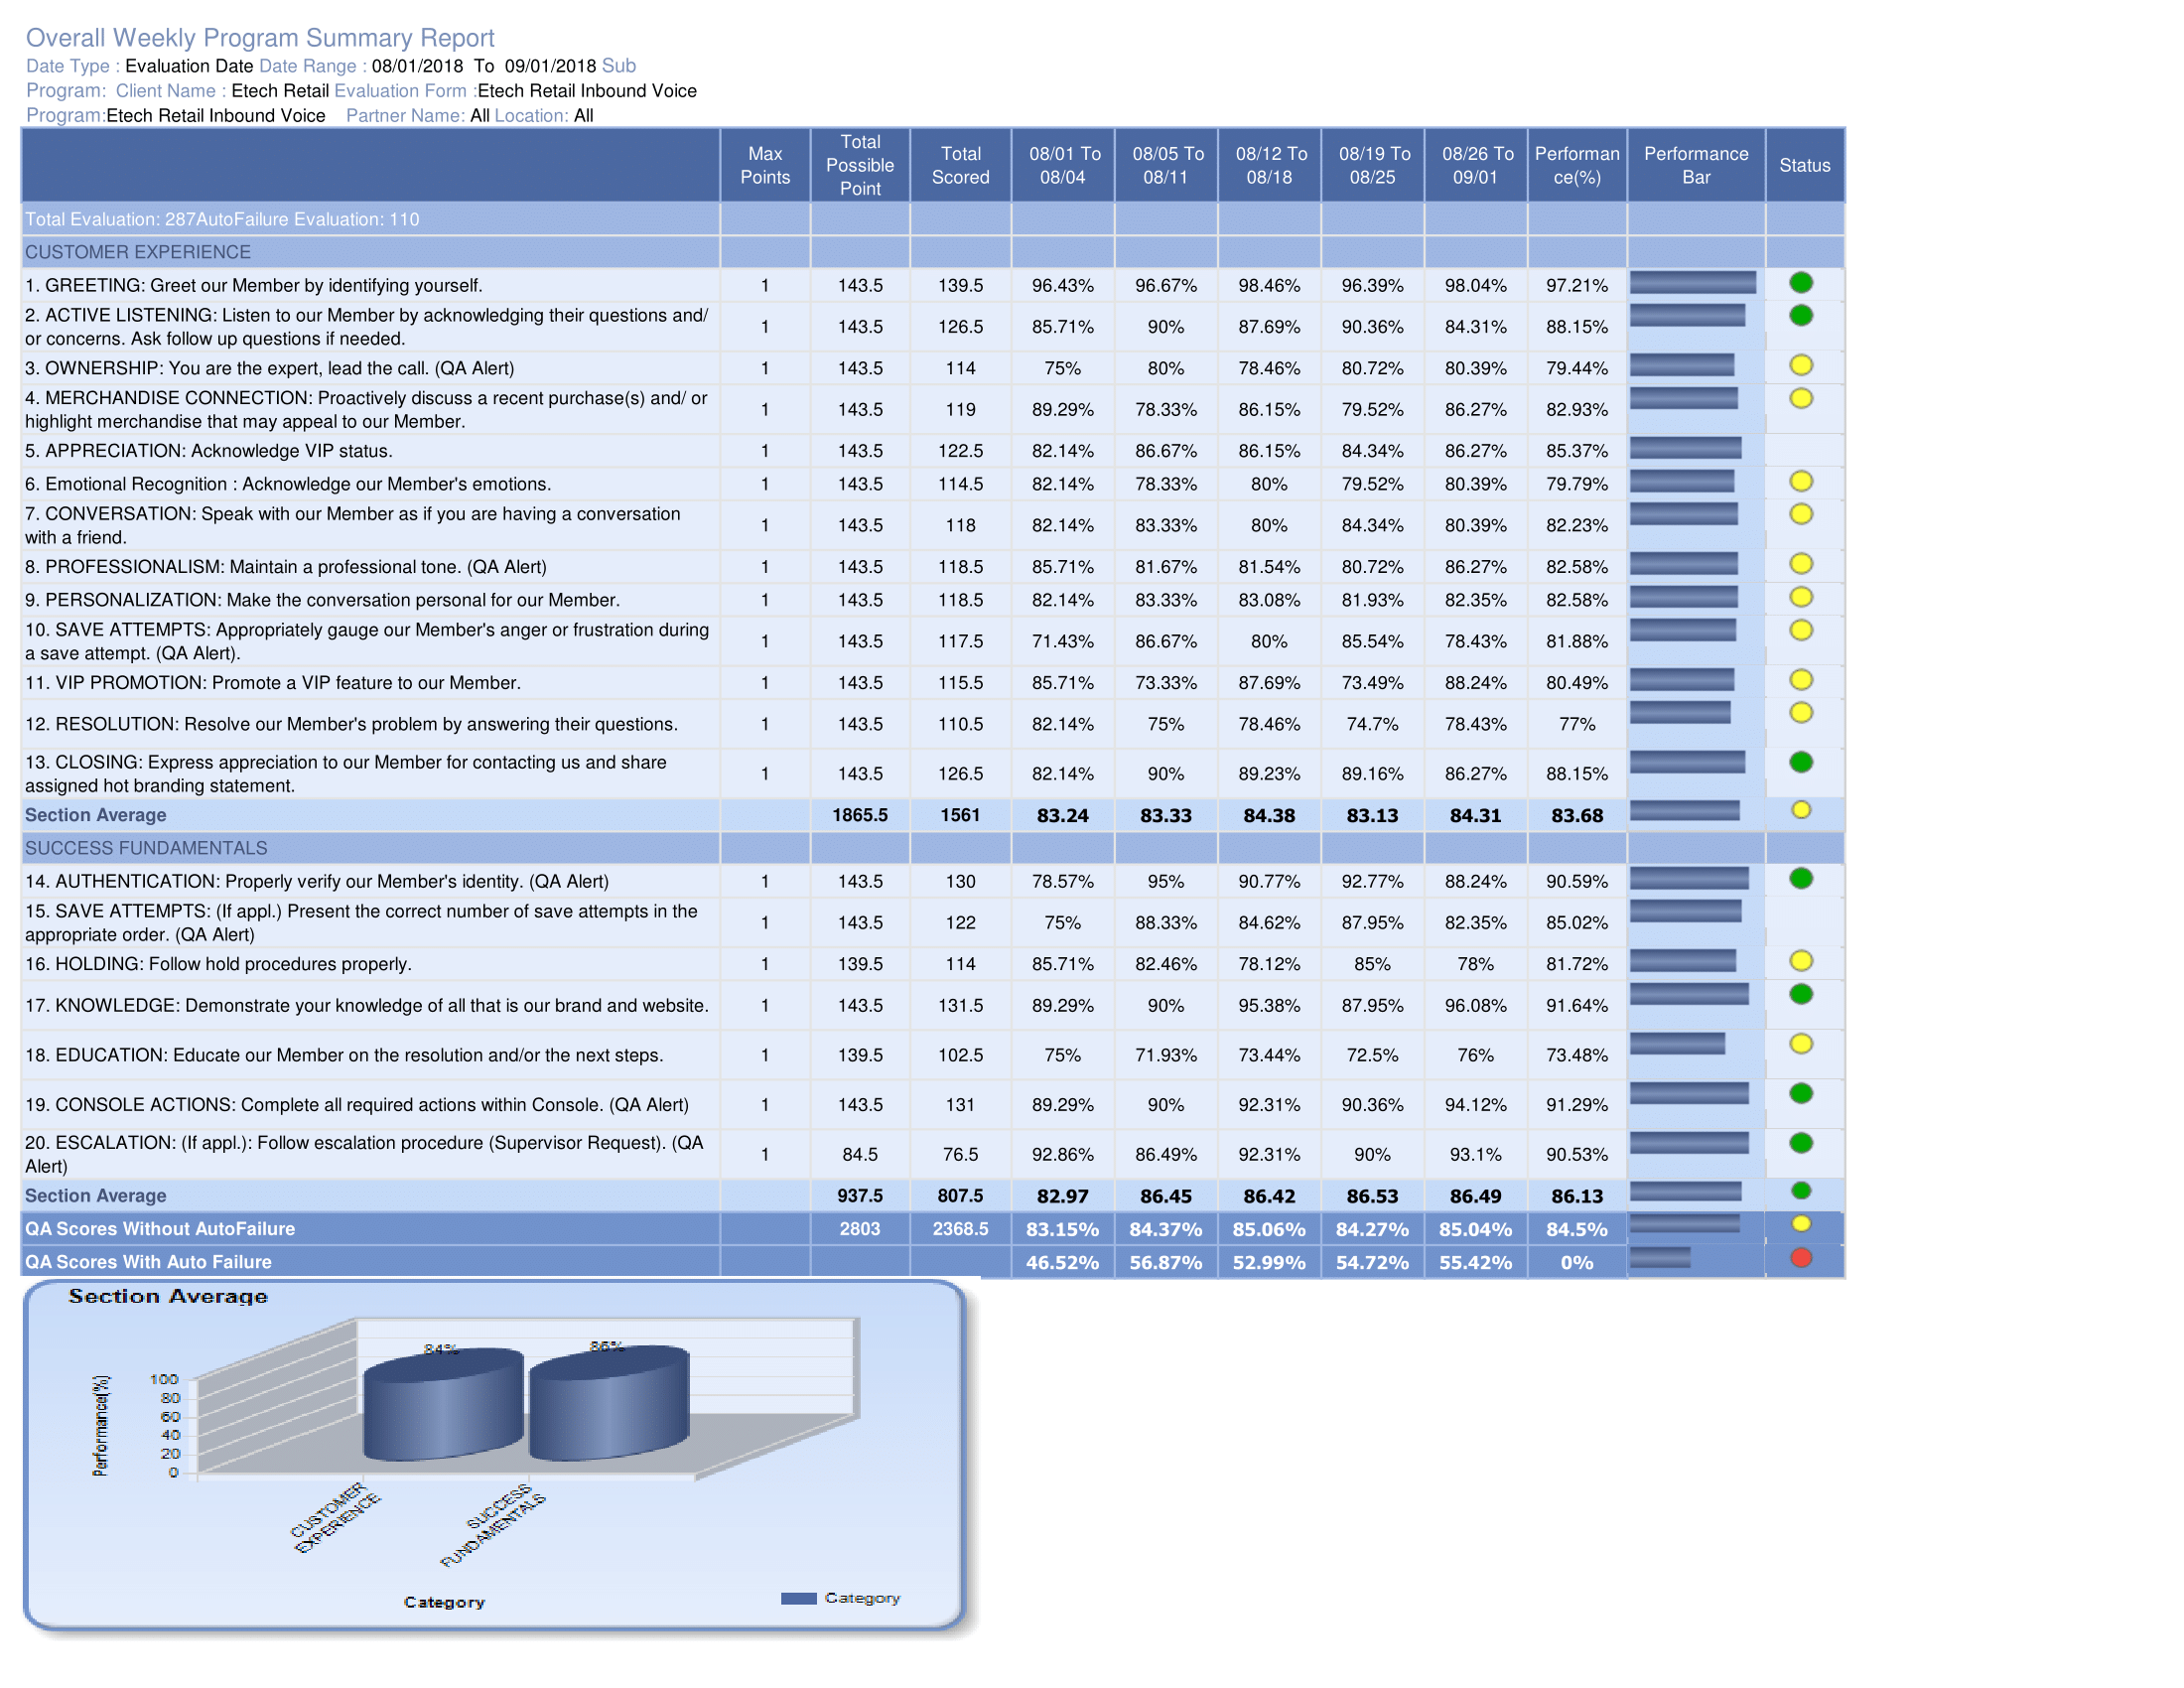 Overall weekly program summary report